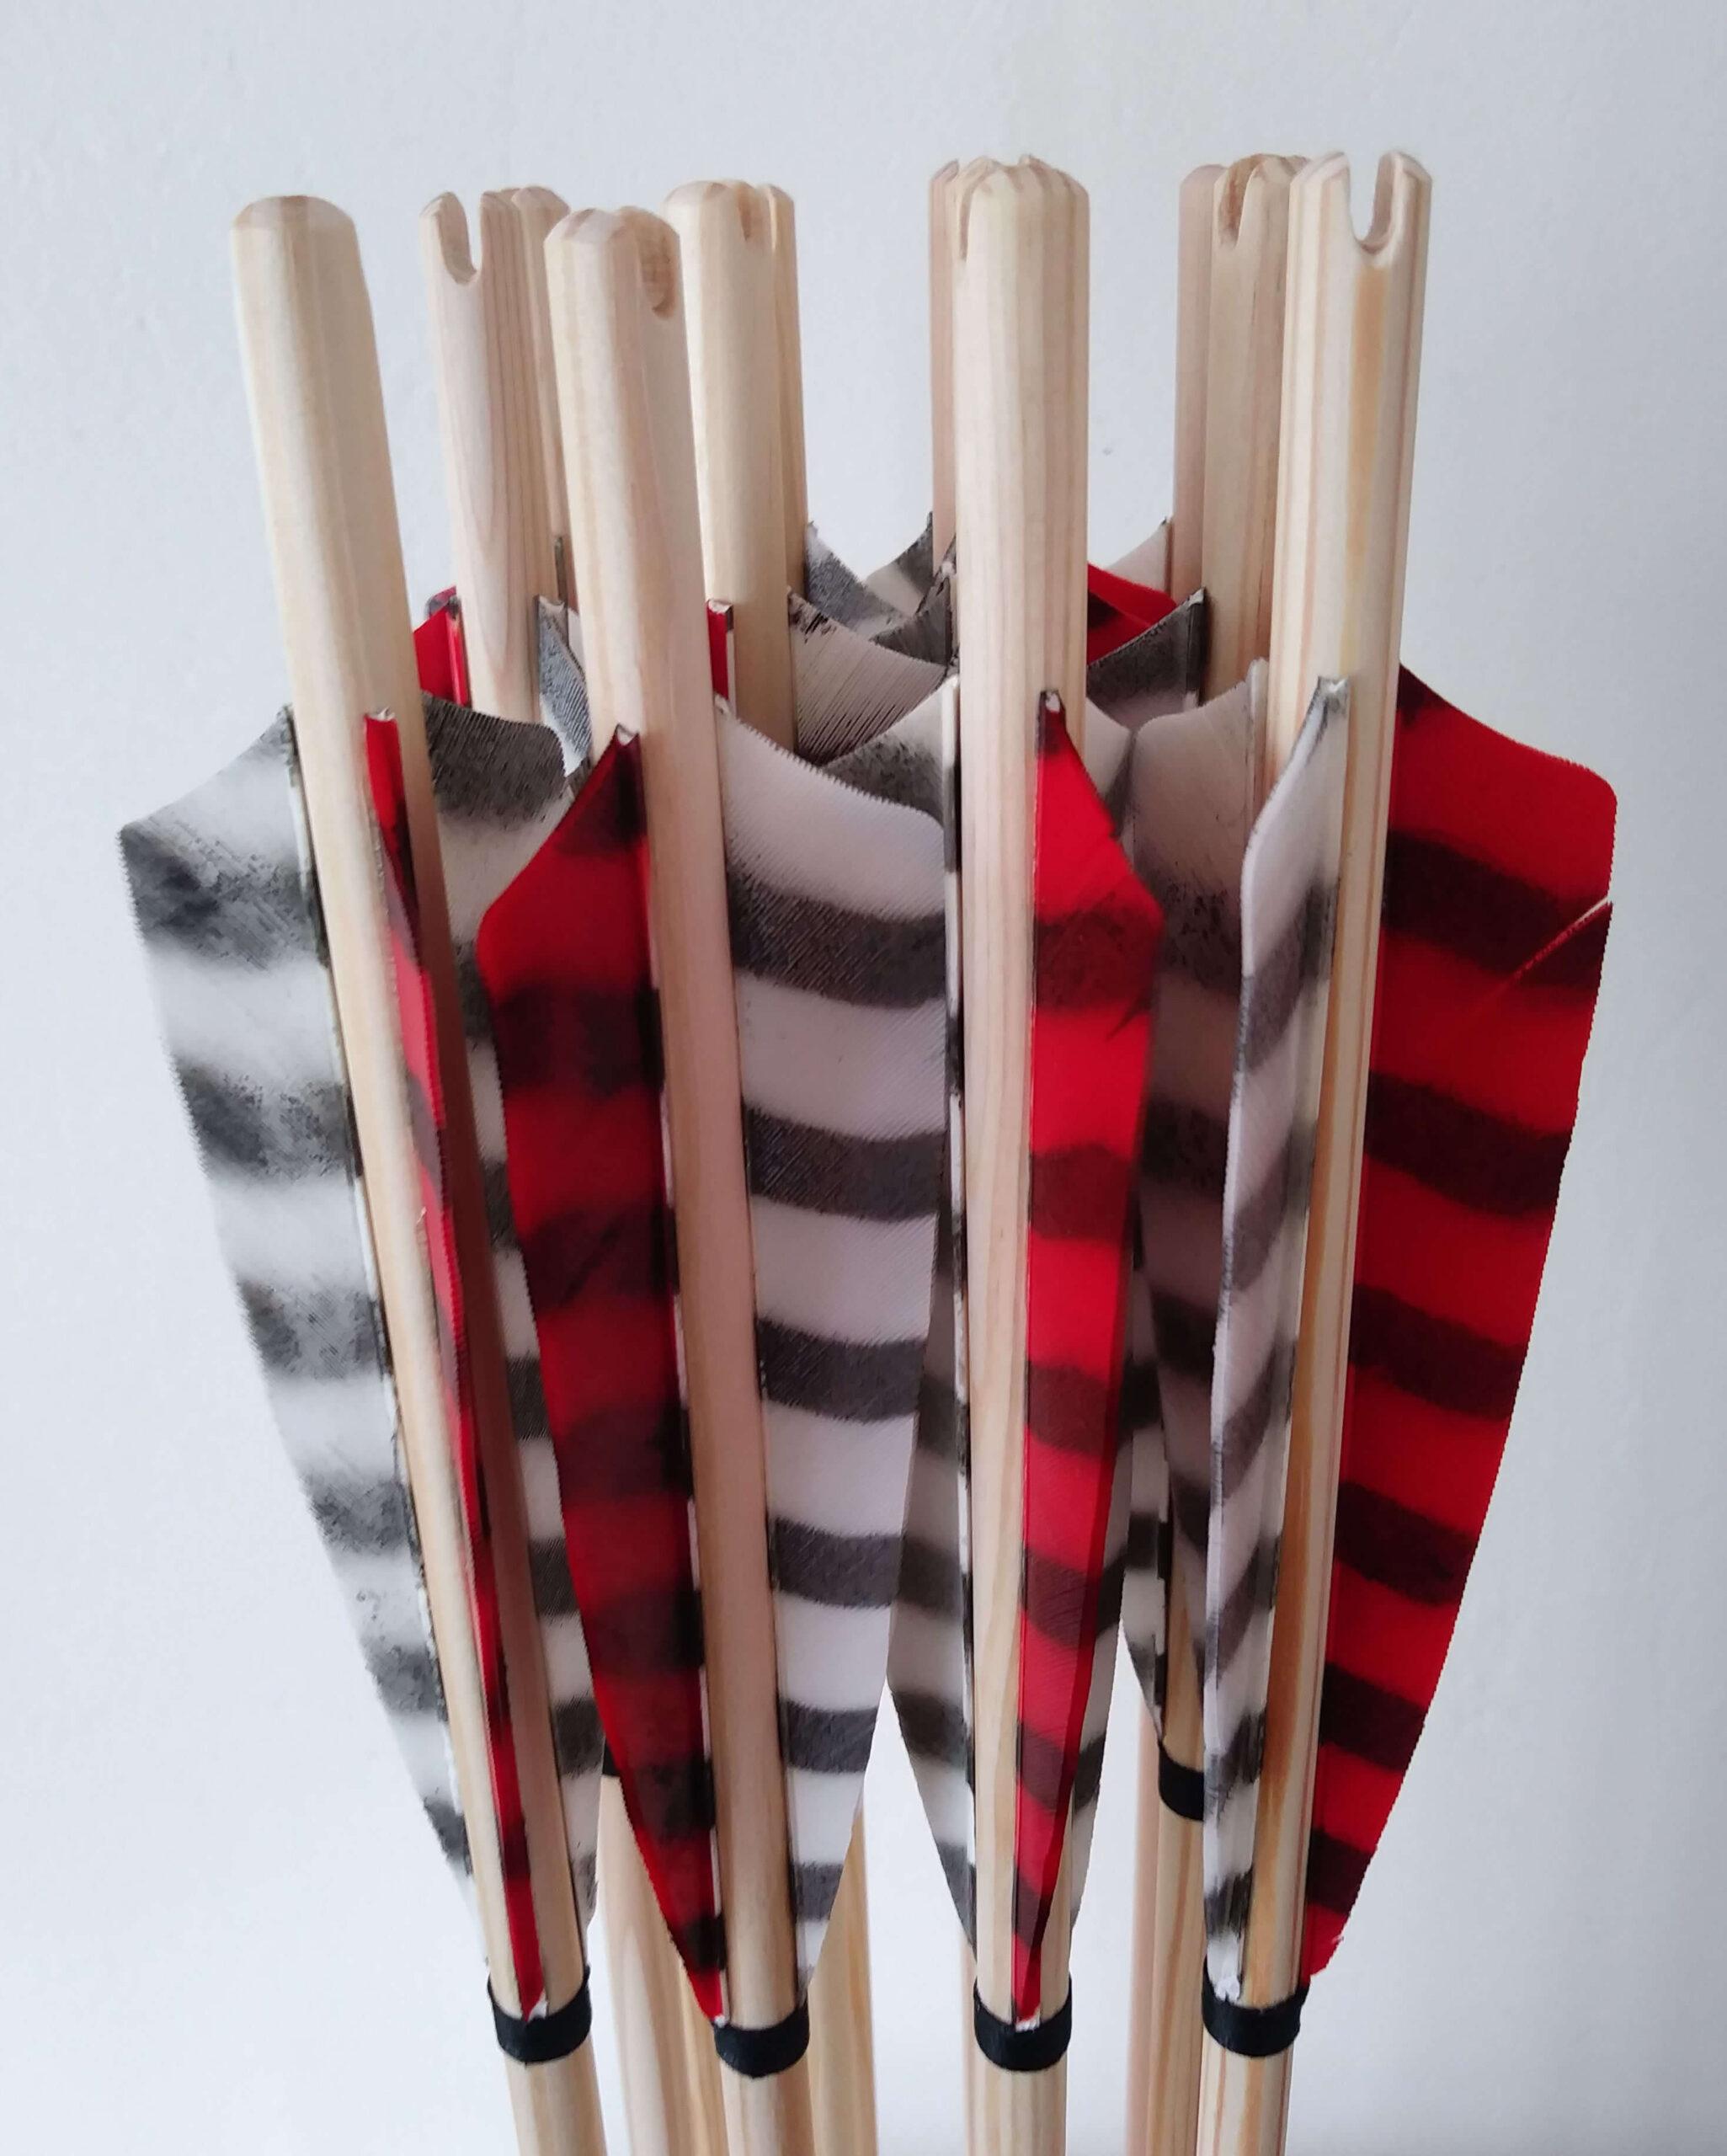 Self Nocked Arrows 5 Inch Fletched x 12